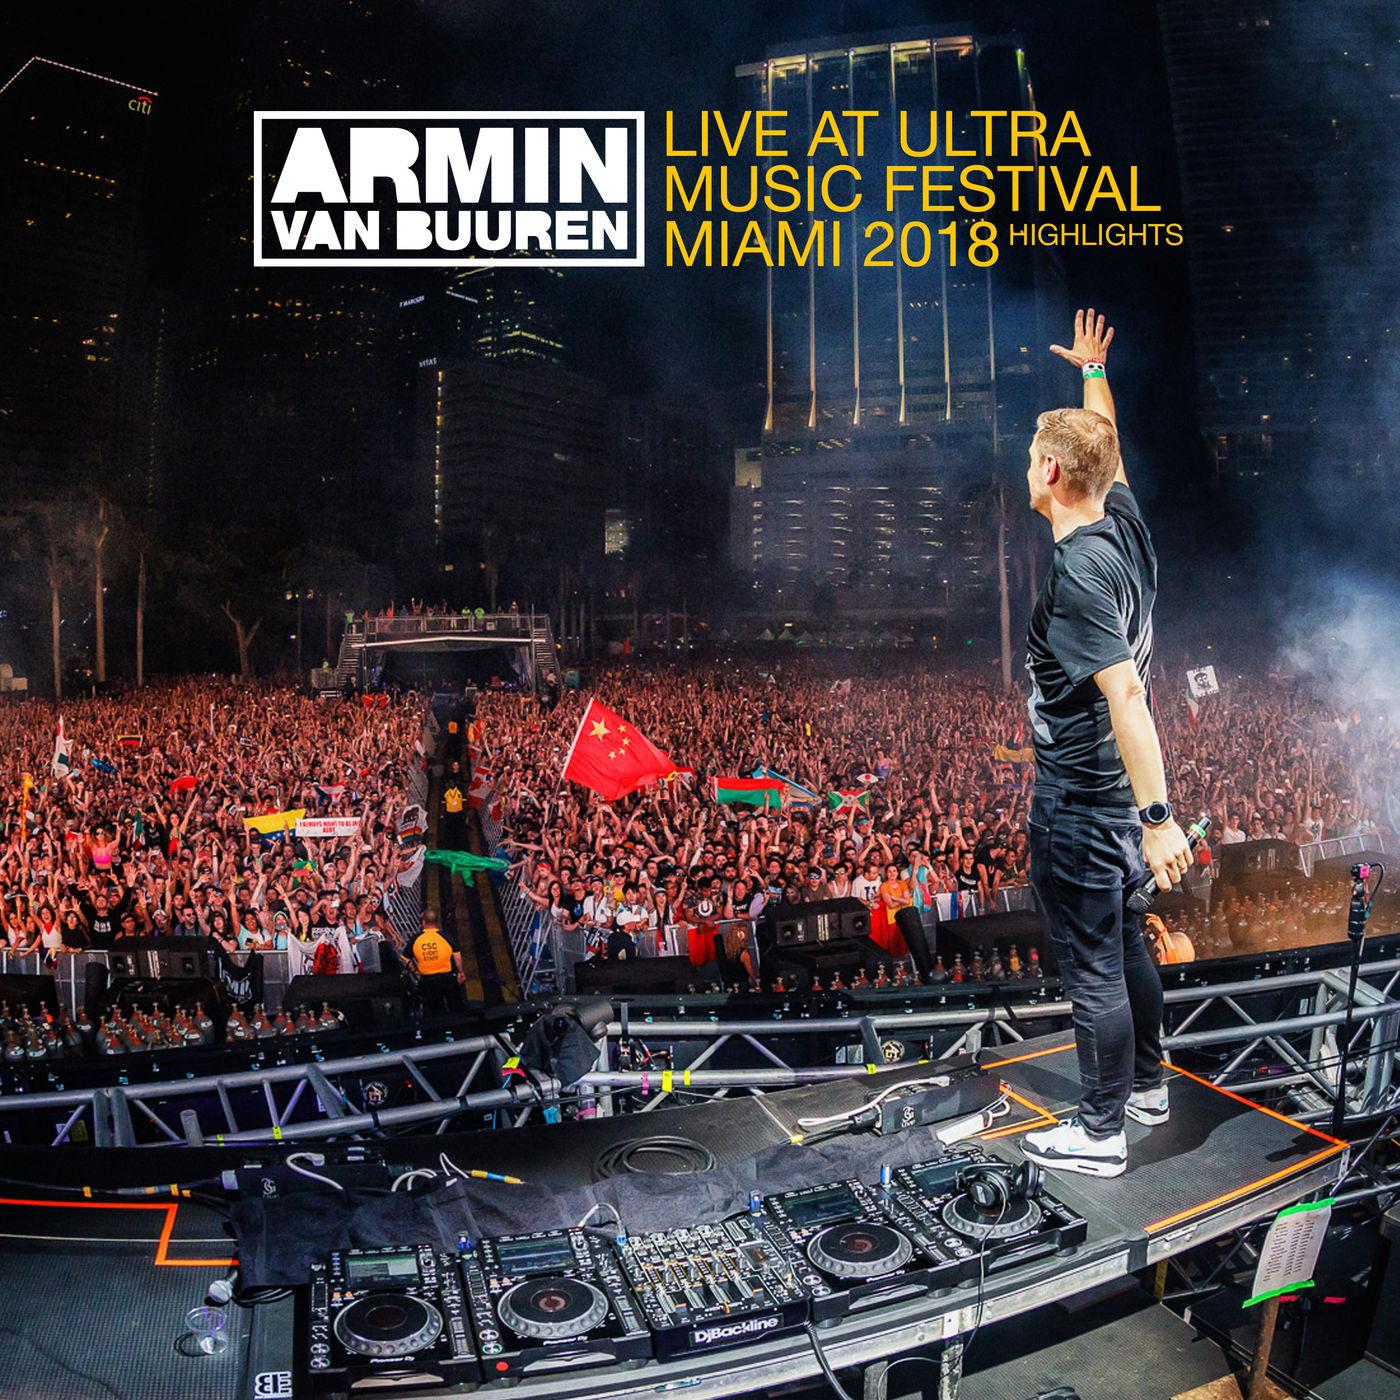 Armin van Buuren - Live at Ultra Music Festival M